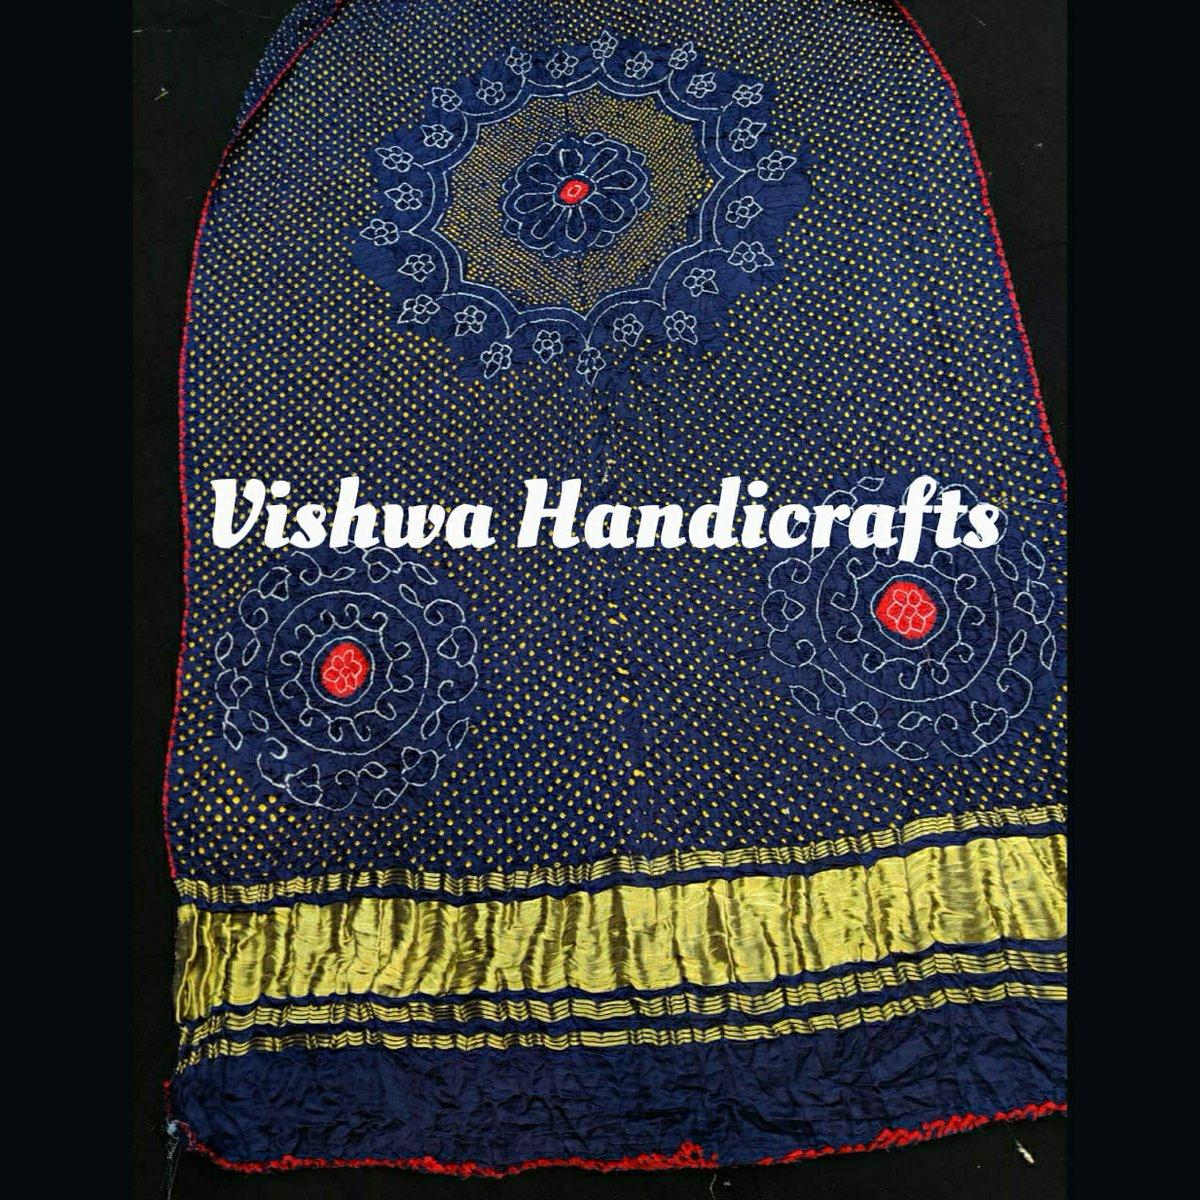 Pure gaji silk Rai bandhej dupatta with zari pallu. #vishwahandicrafts #dupattaonline #bandhej #raidanabandhej #gajisilkdupatta #followforfollow #tissuepallu #ethniclook